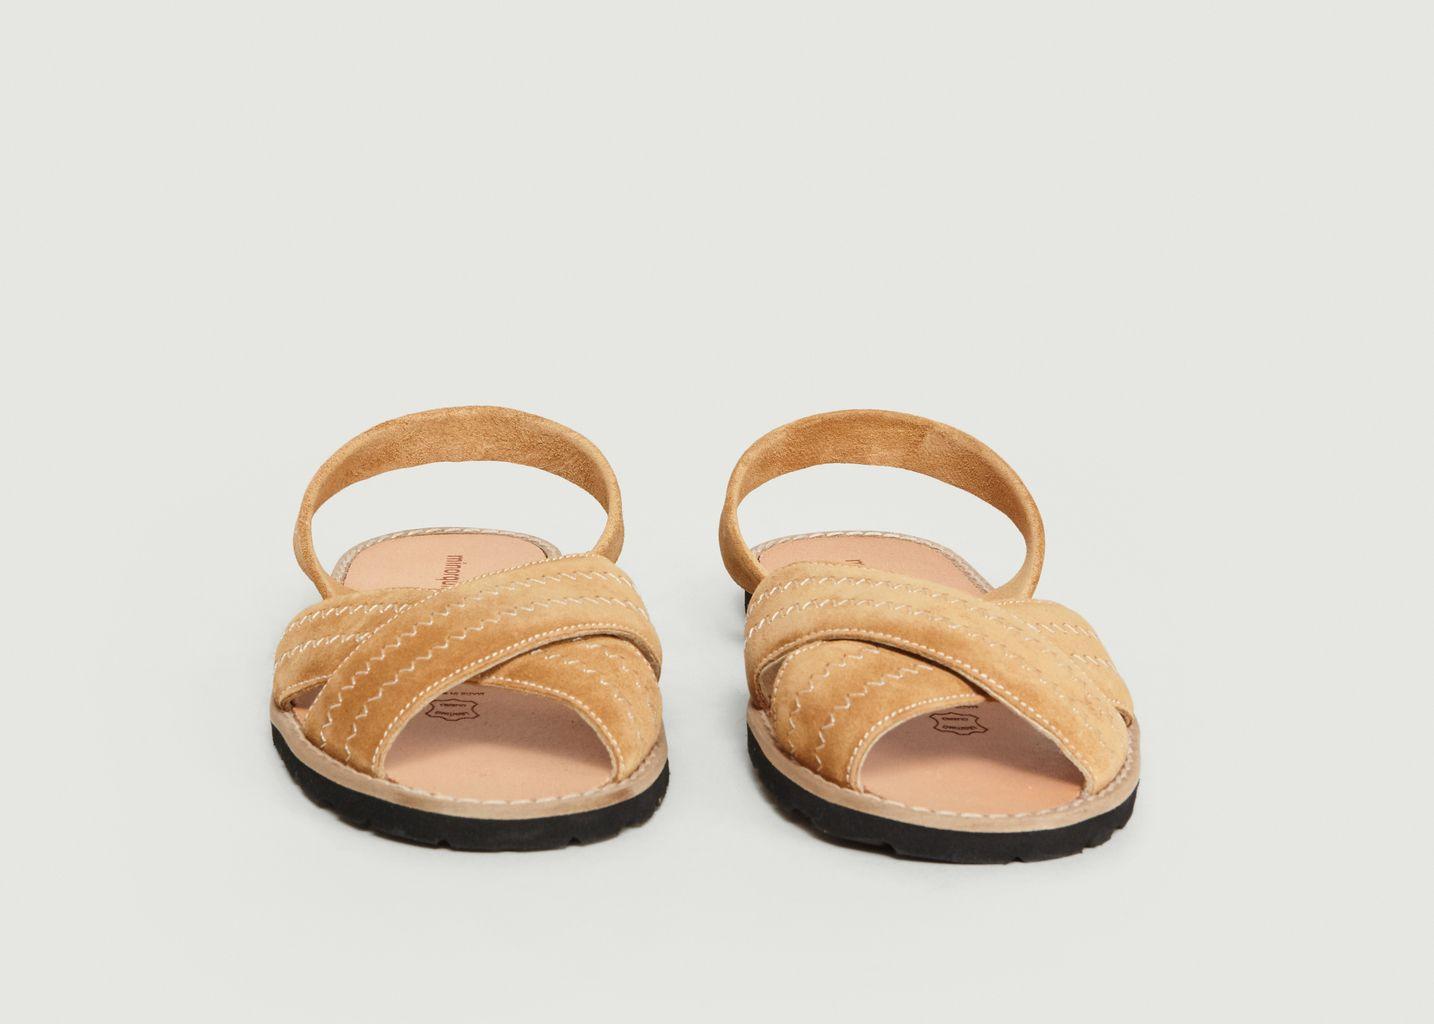 Sandales Avarca Berlin Velours - Minorquines